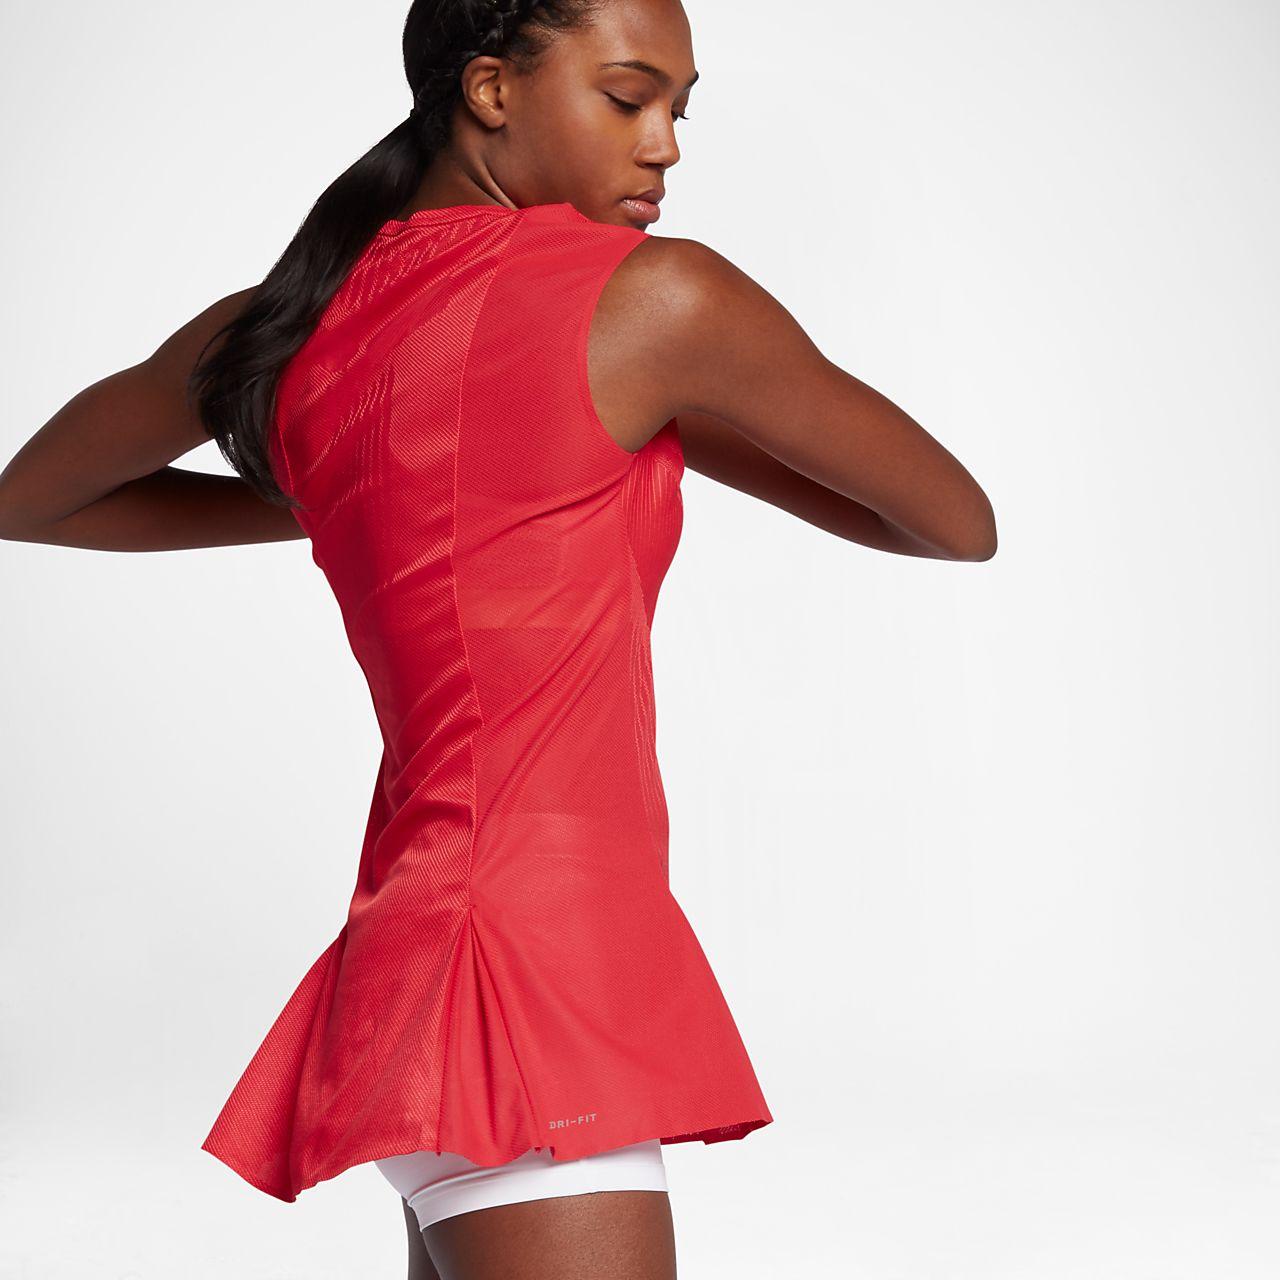 Robe de tennis nikecourt dry slam pour femme be - Robe tennis femme ...